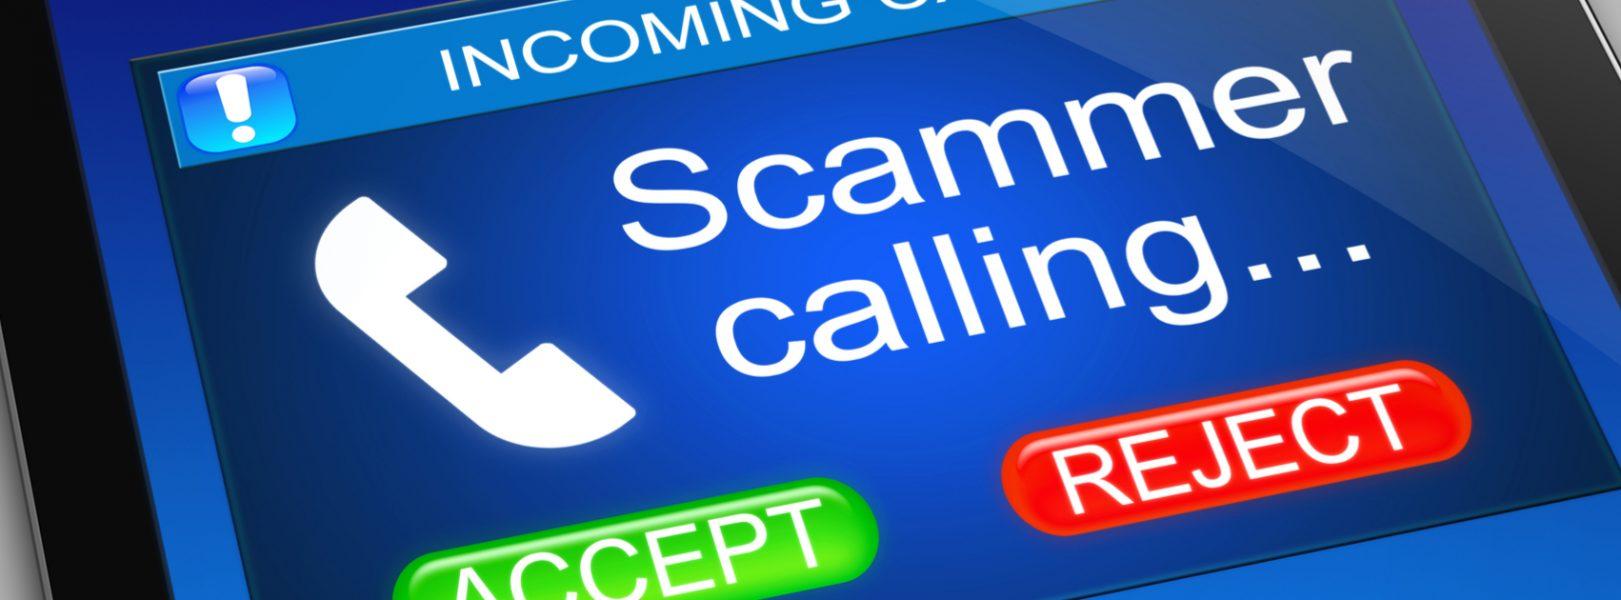 Centrelink Scam Alert First Financial Melbourne